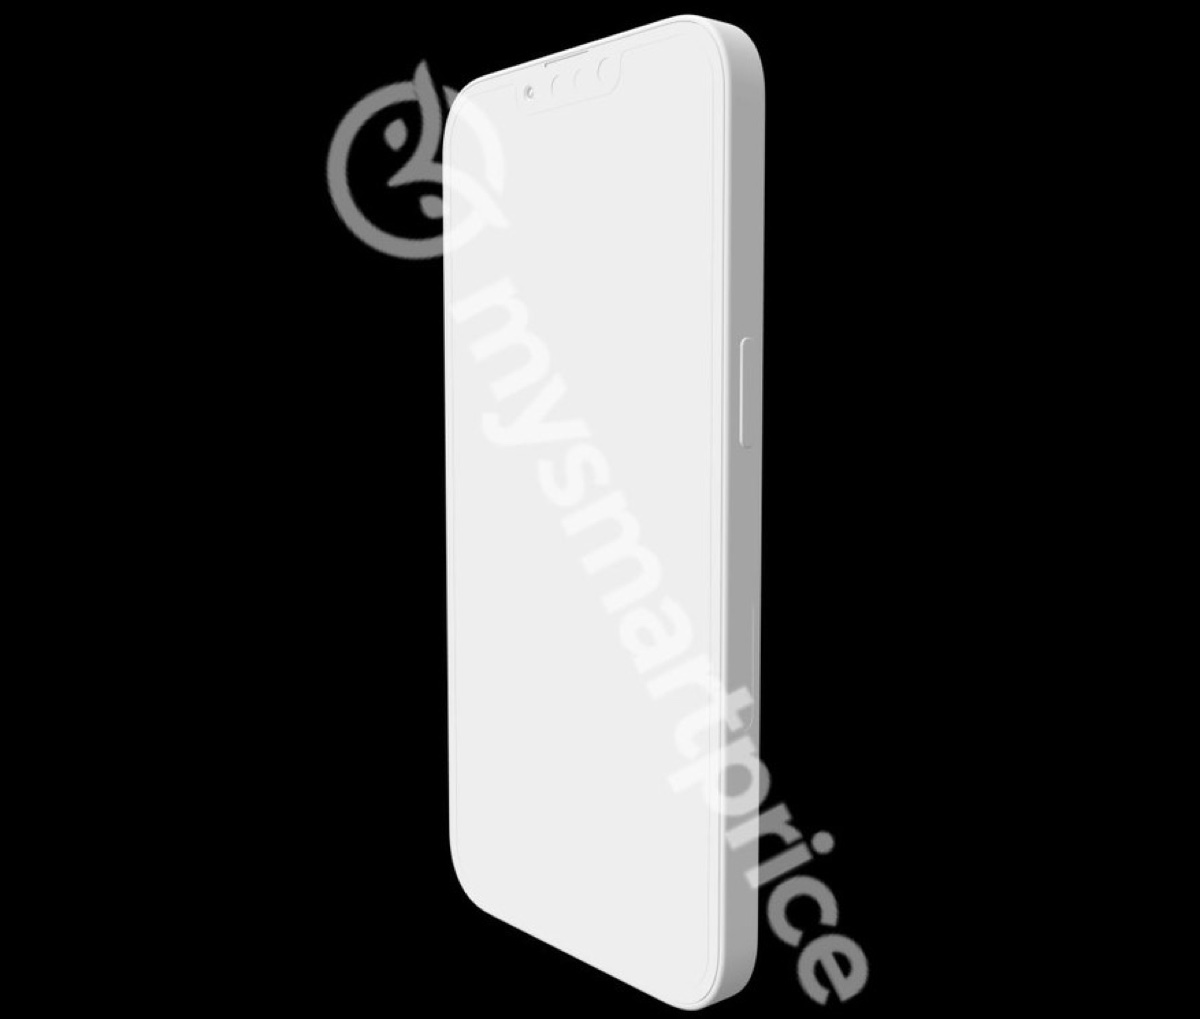 iPhone 13 forse avrà le fotocamere disposte in diagonale